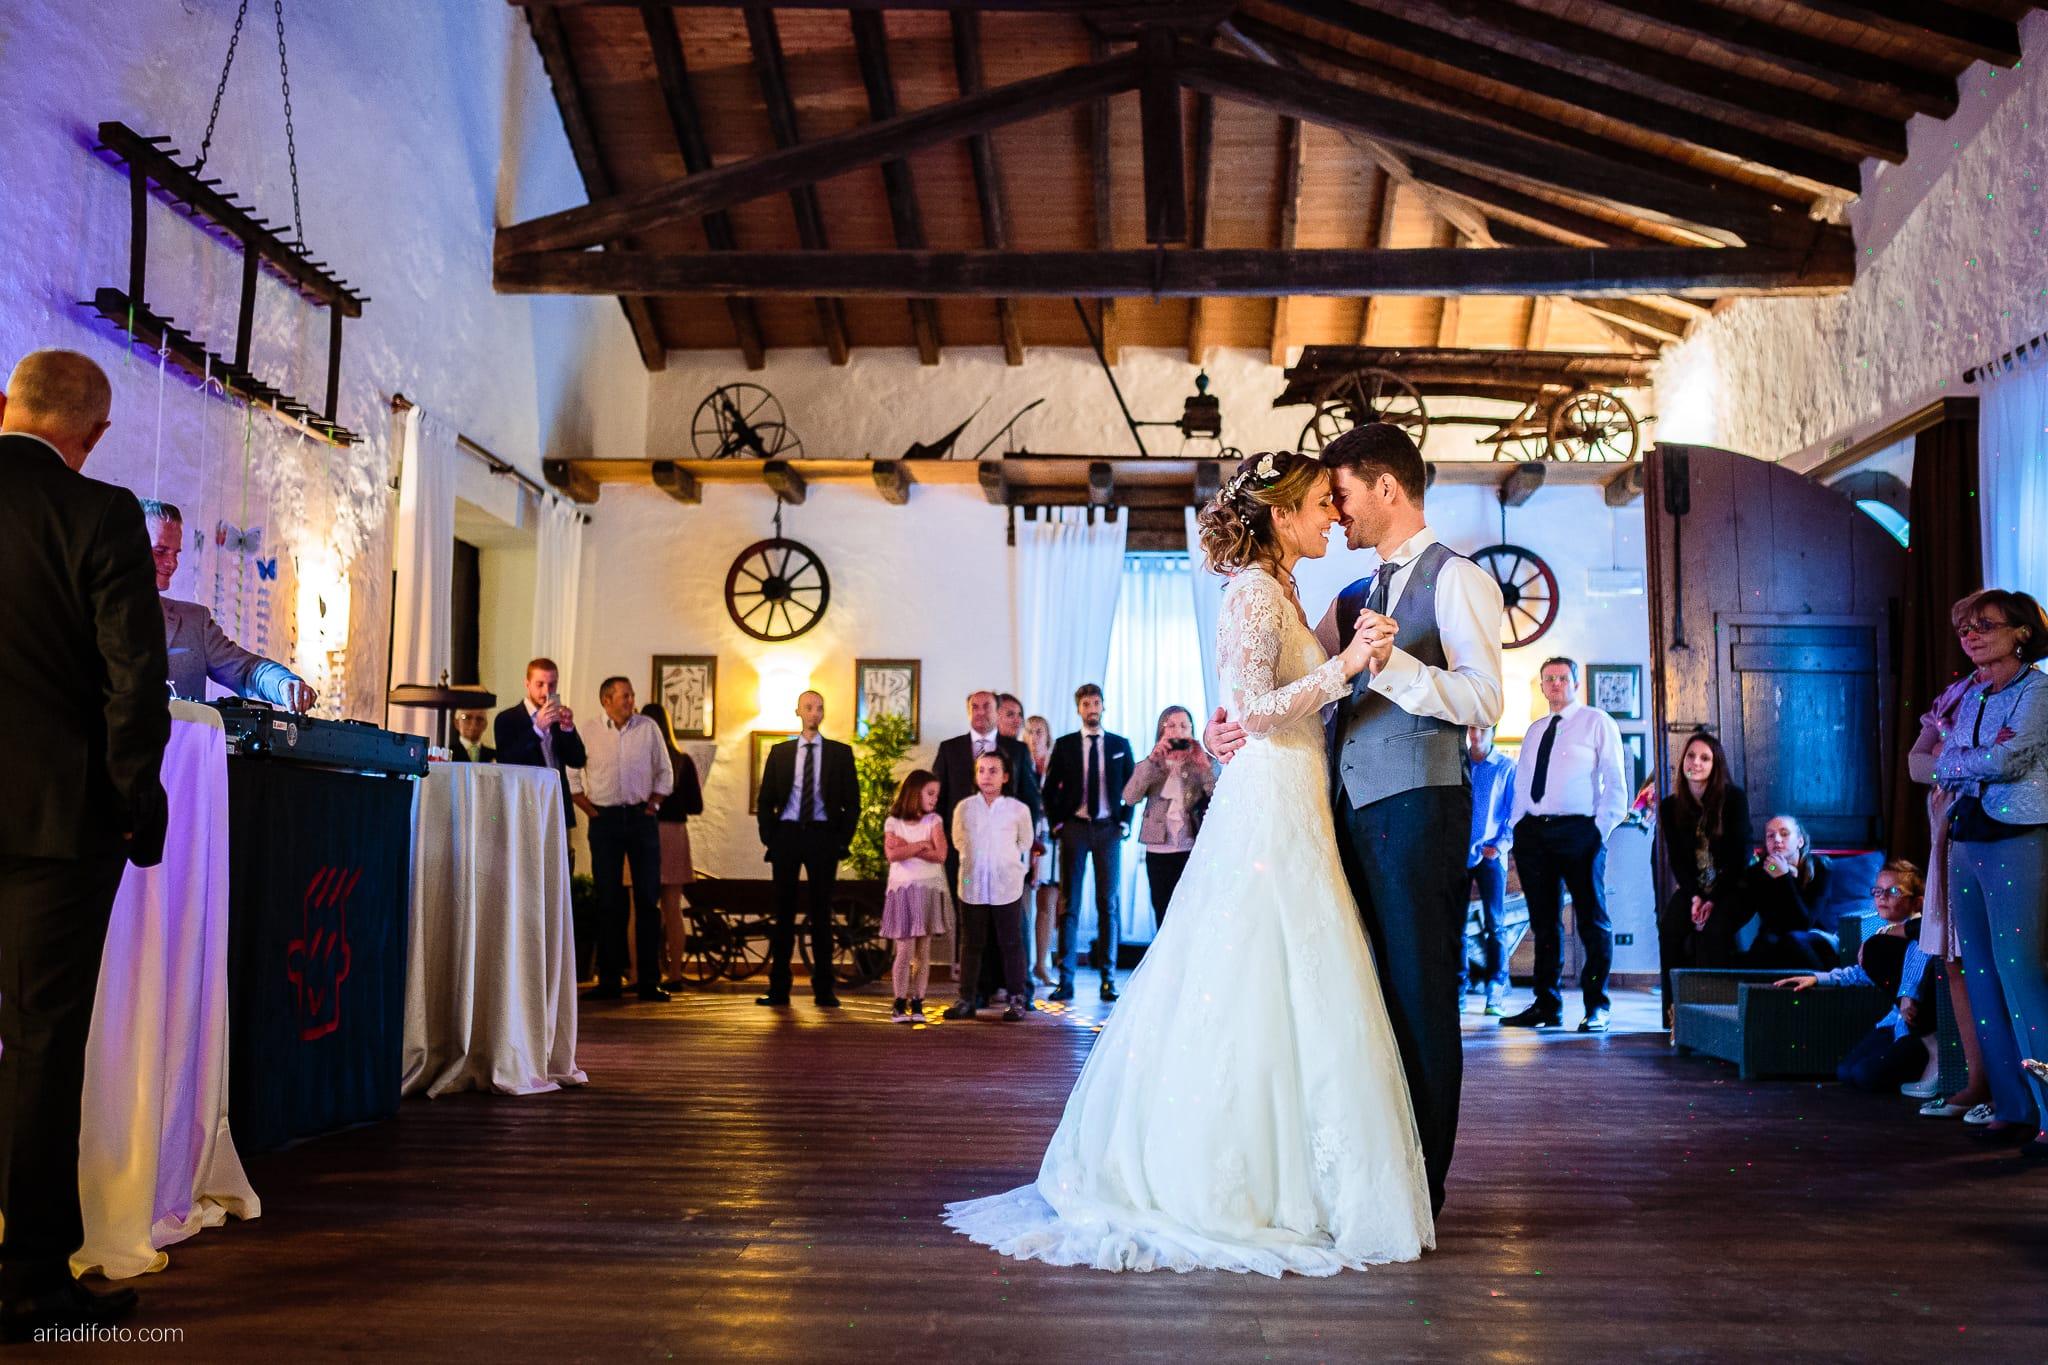 Eleonora Elia Matrimonio Tarcento Udine Baronesse Tacco Gorizia ricevimento festa primo ballo